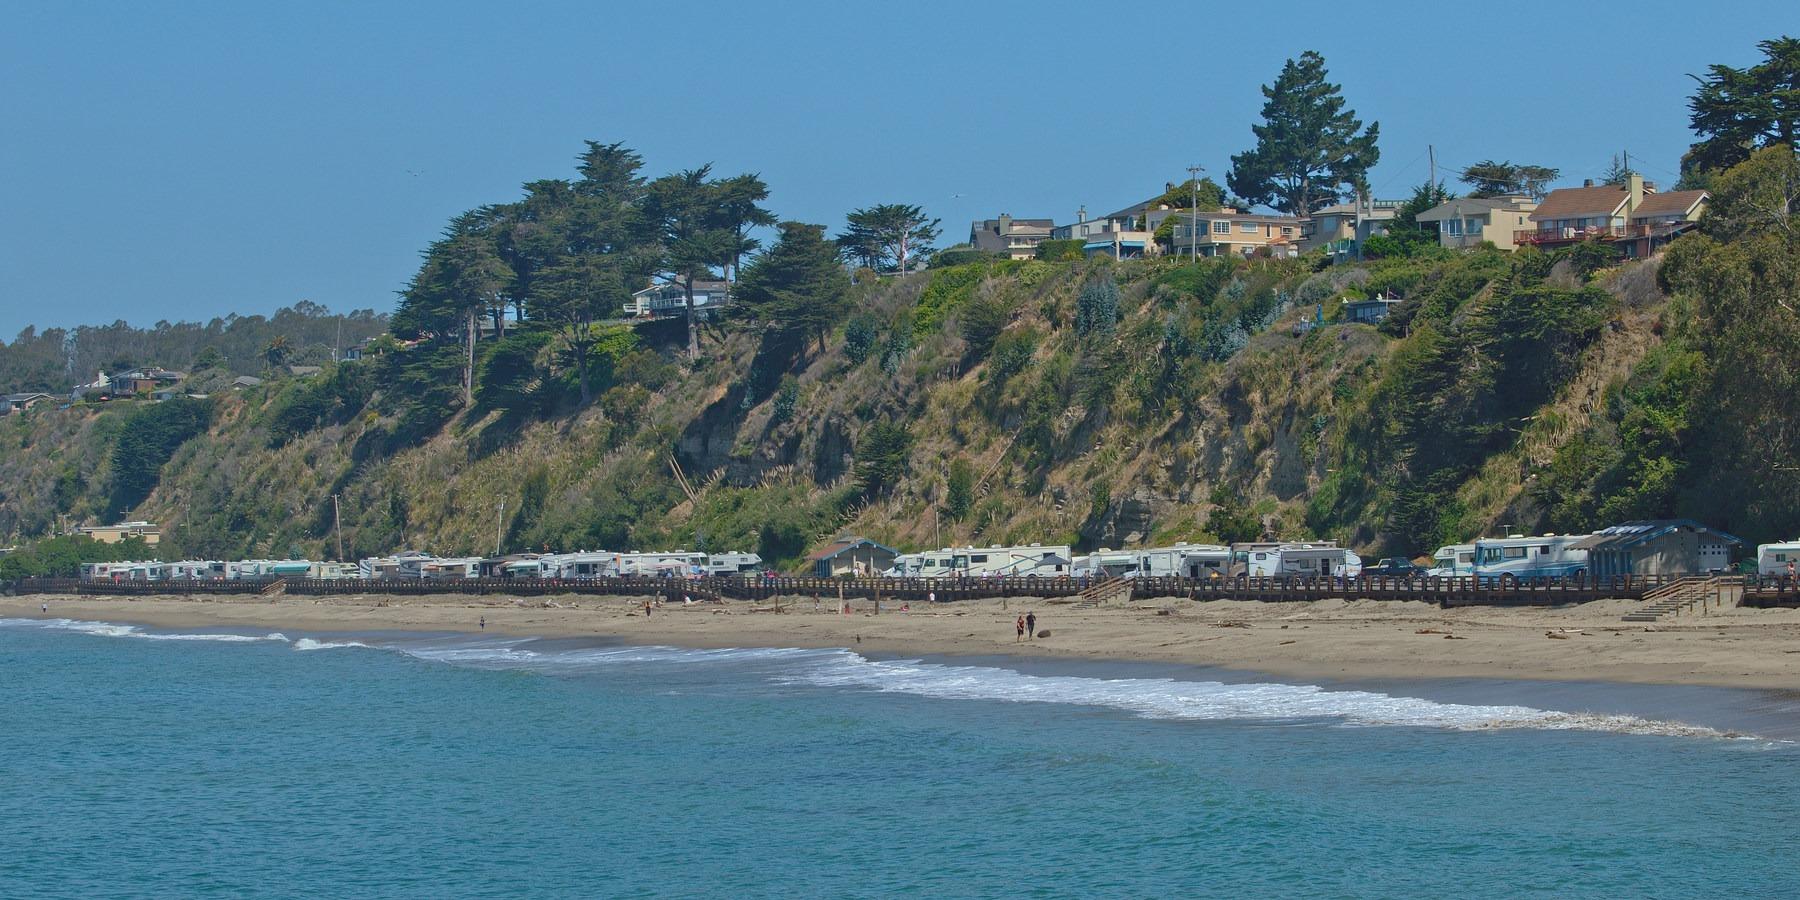 Seacliff State Beach Parking